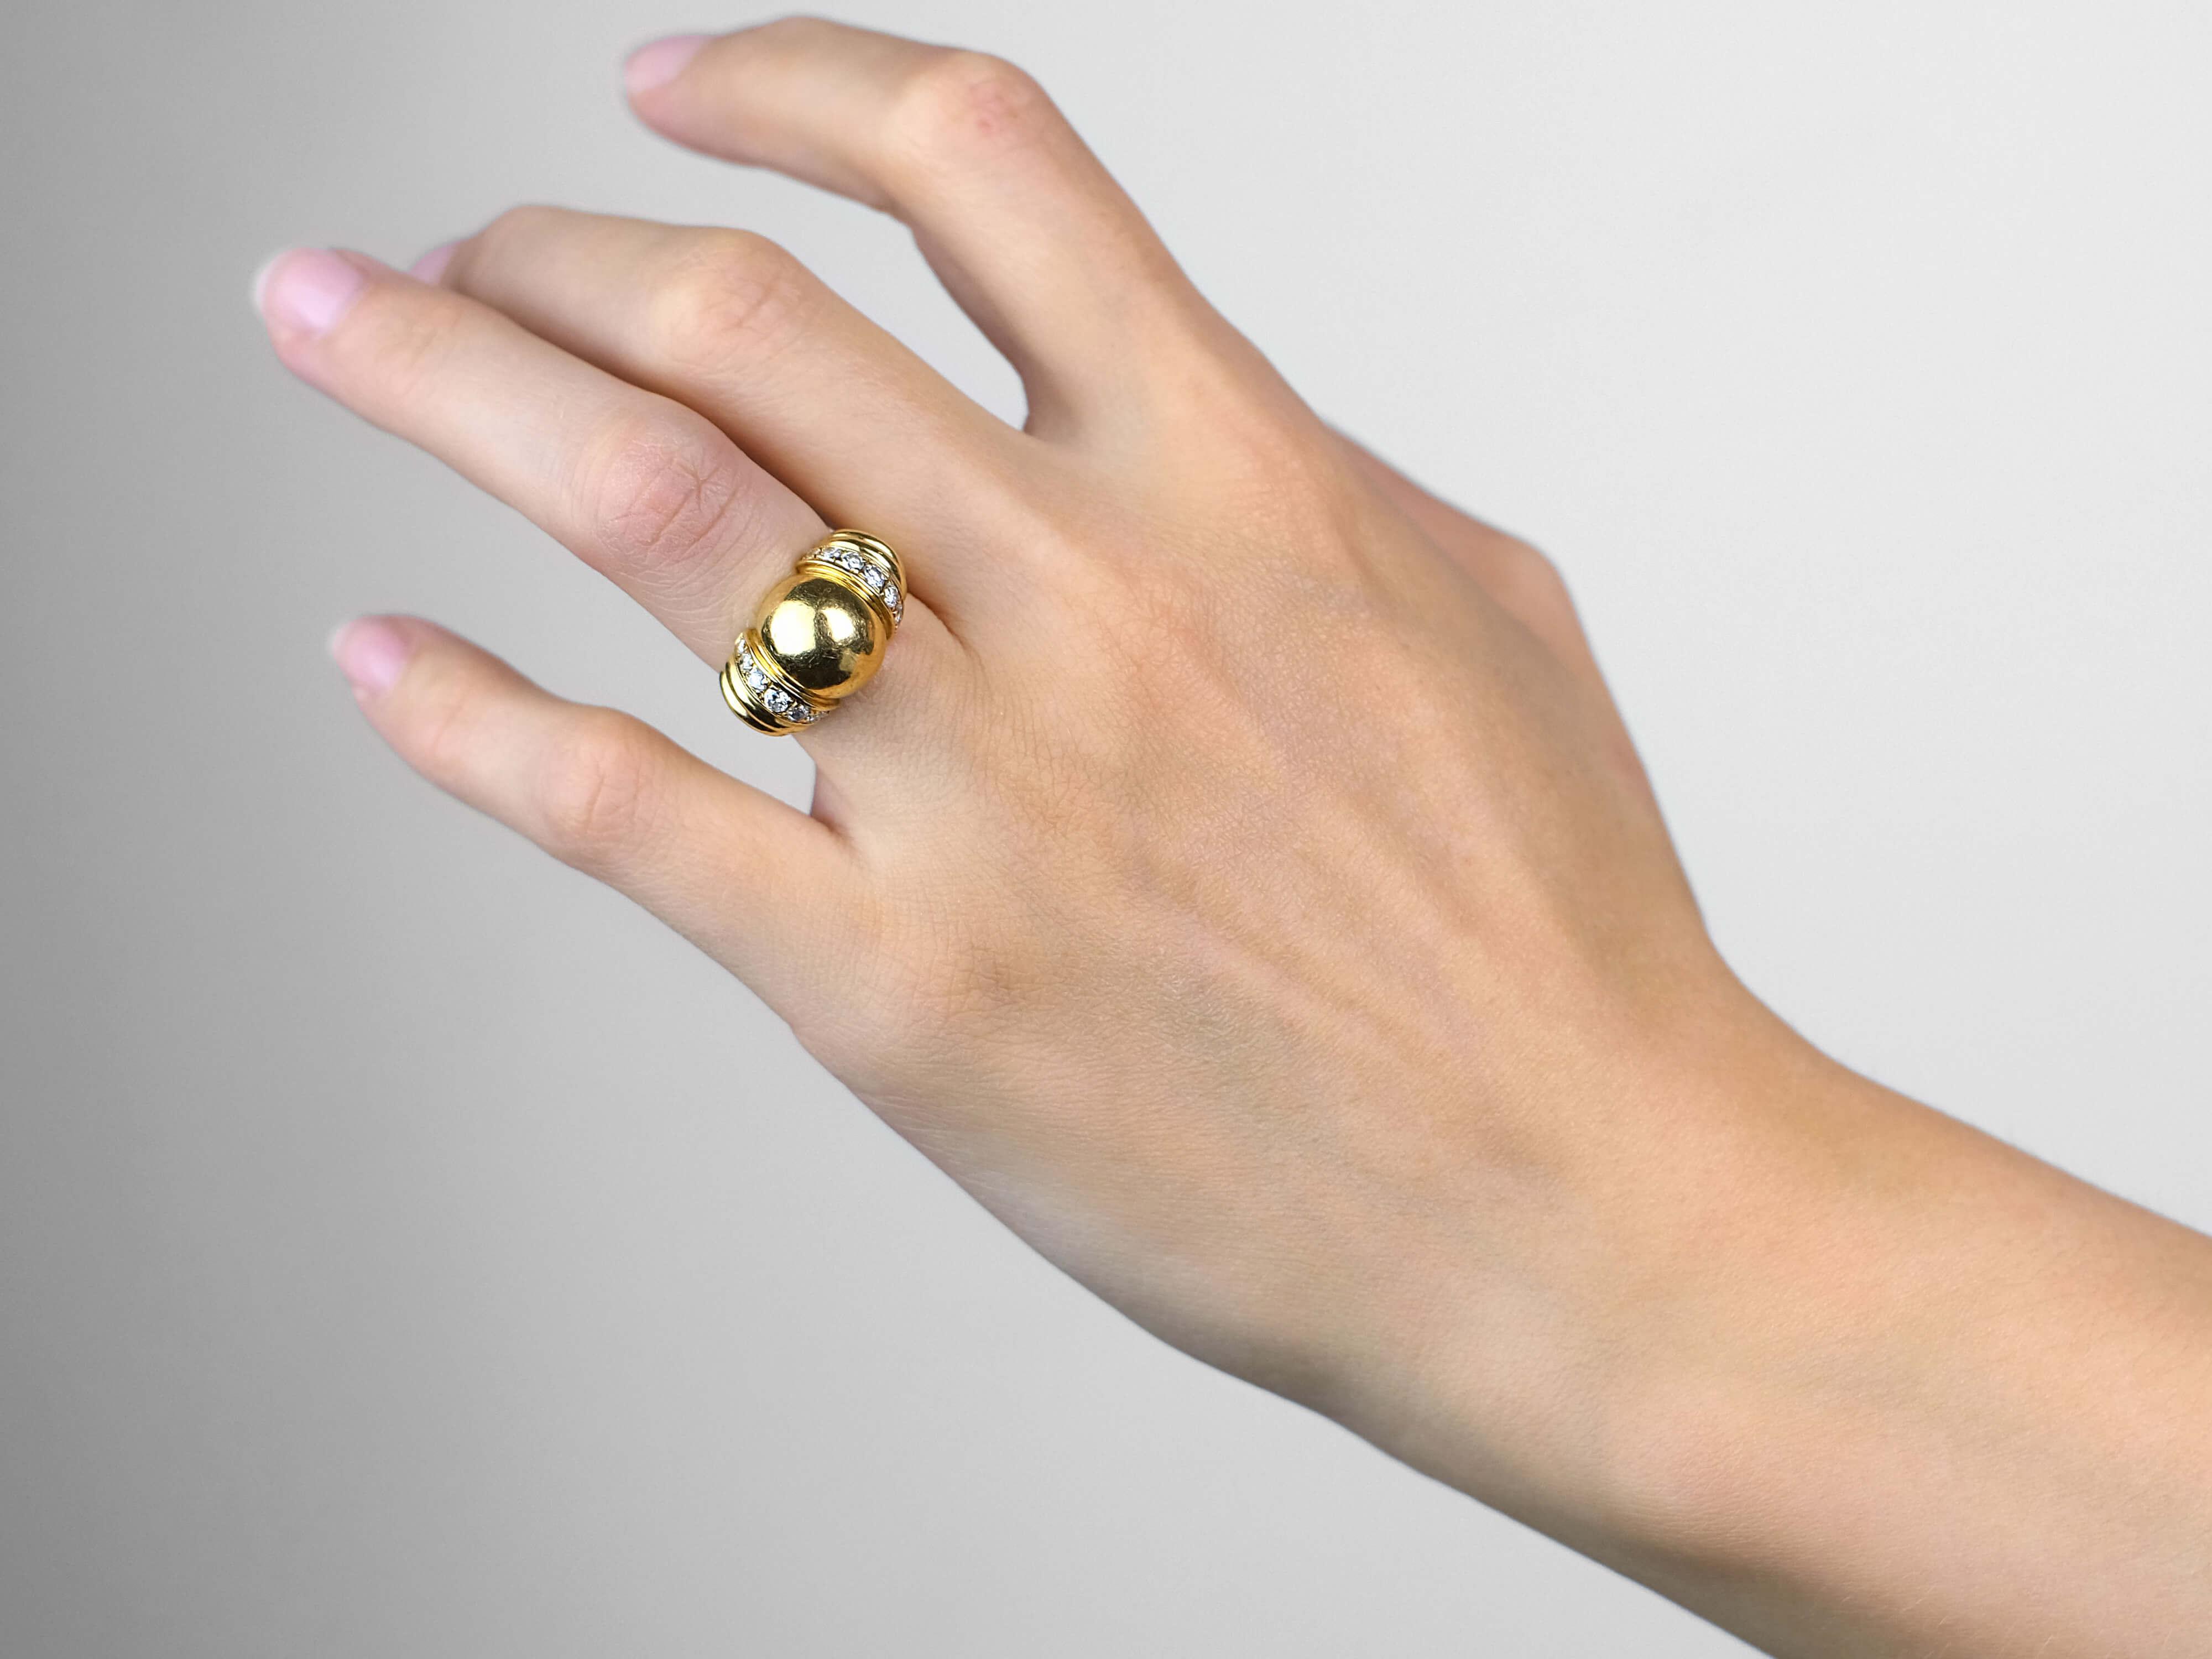 Vintage 18ct Gold & Diamond Ring by Boucheron